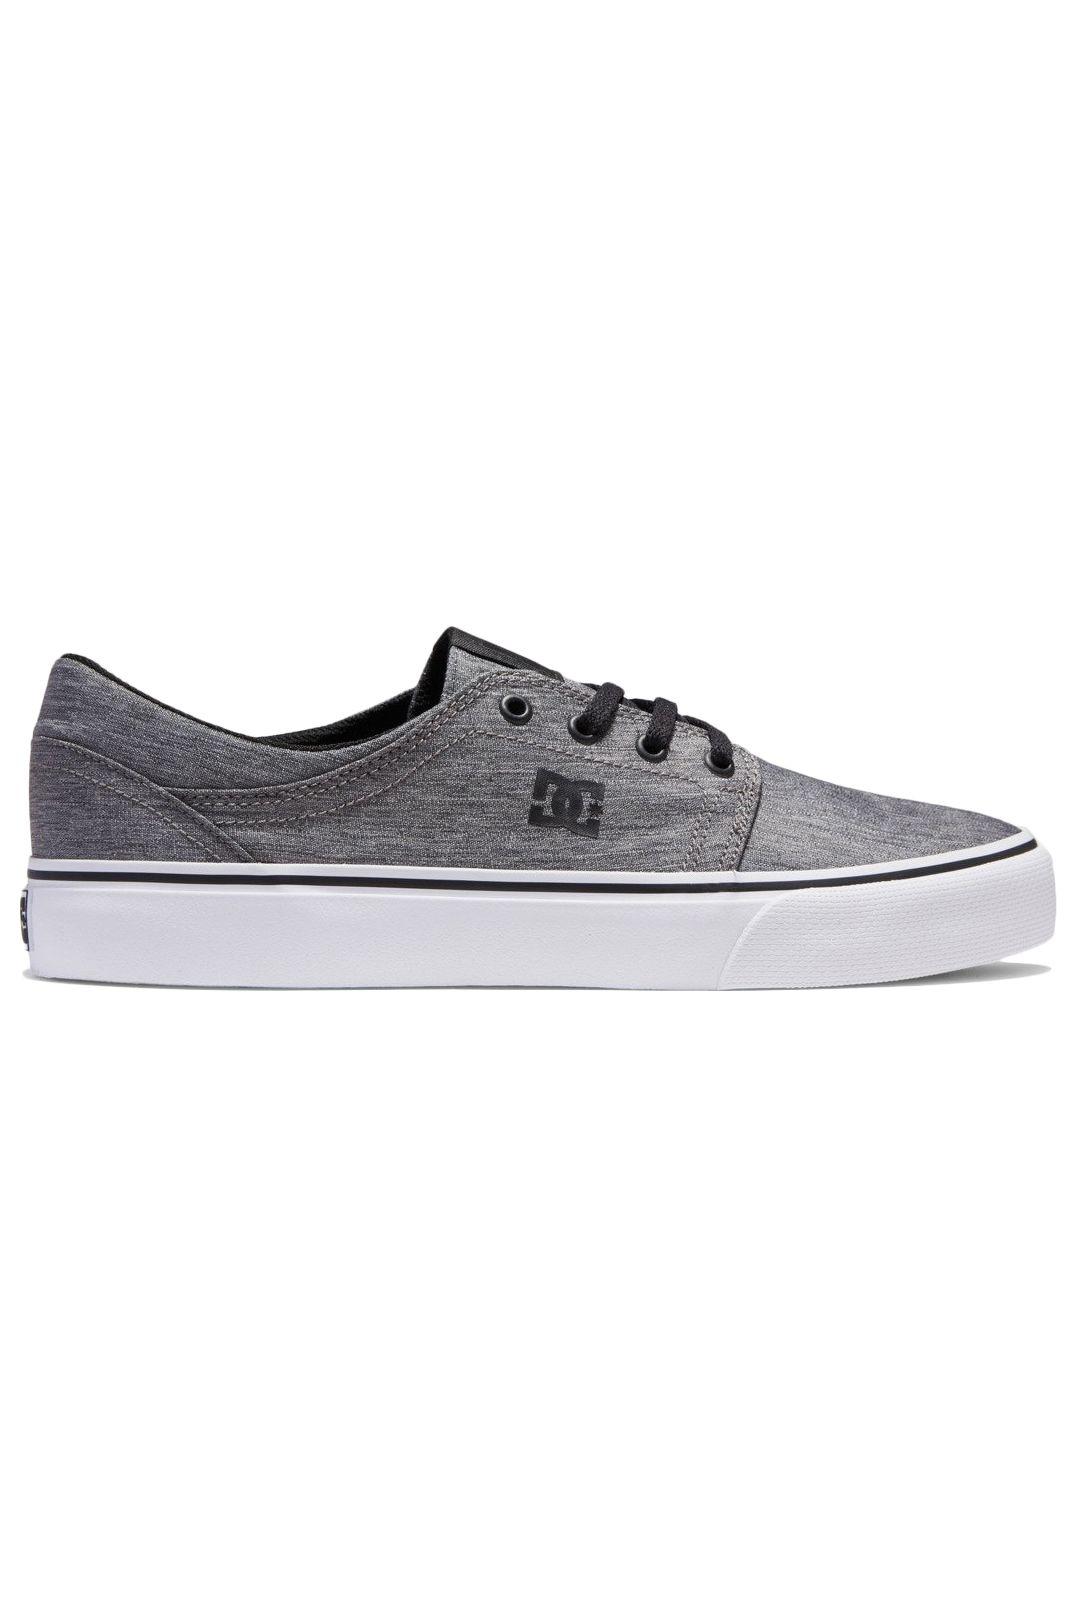 DC Shoes Shoes TRASE TX SE Black/Heather Grey